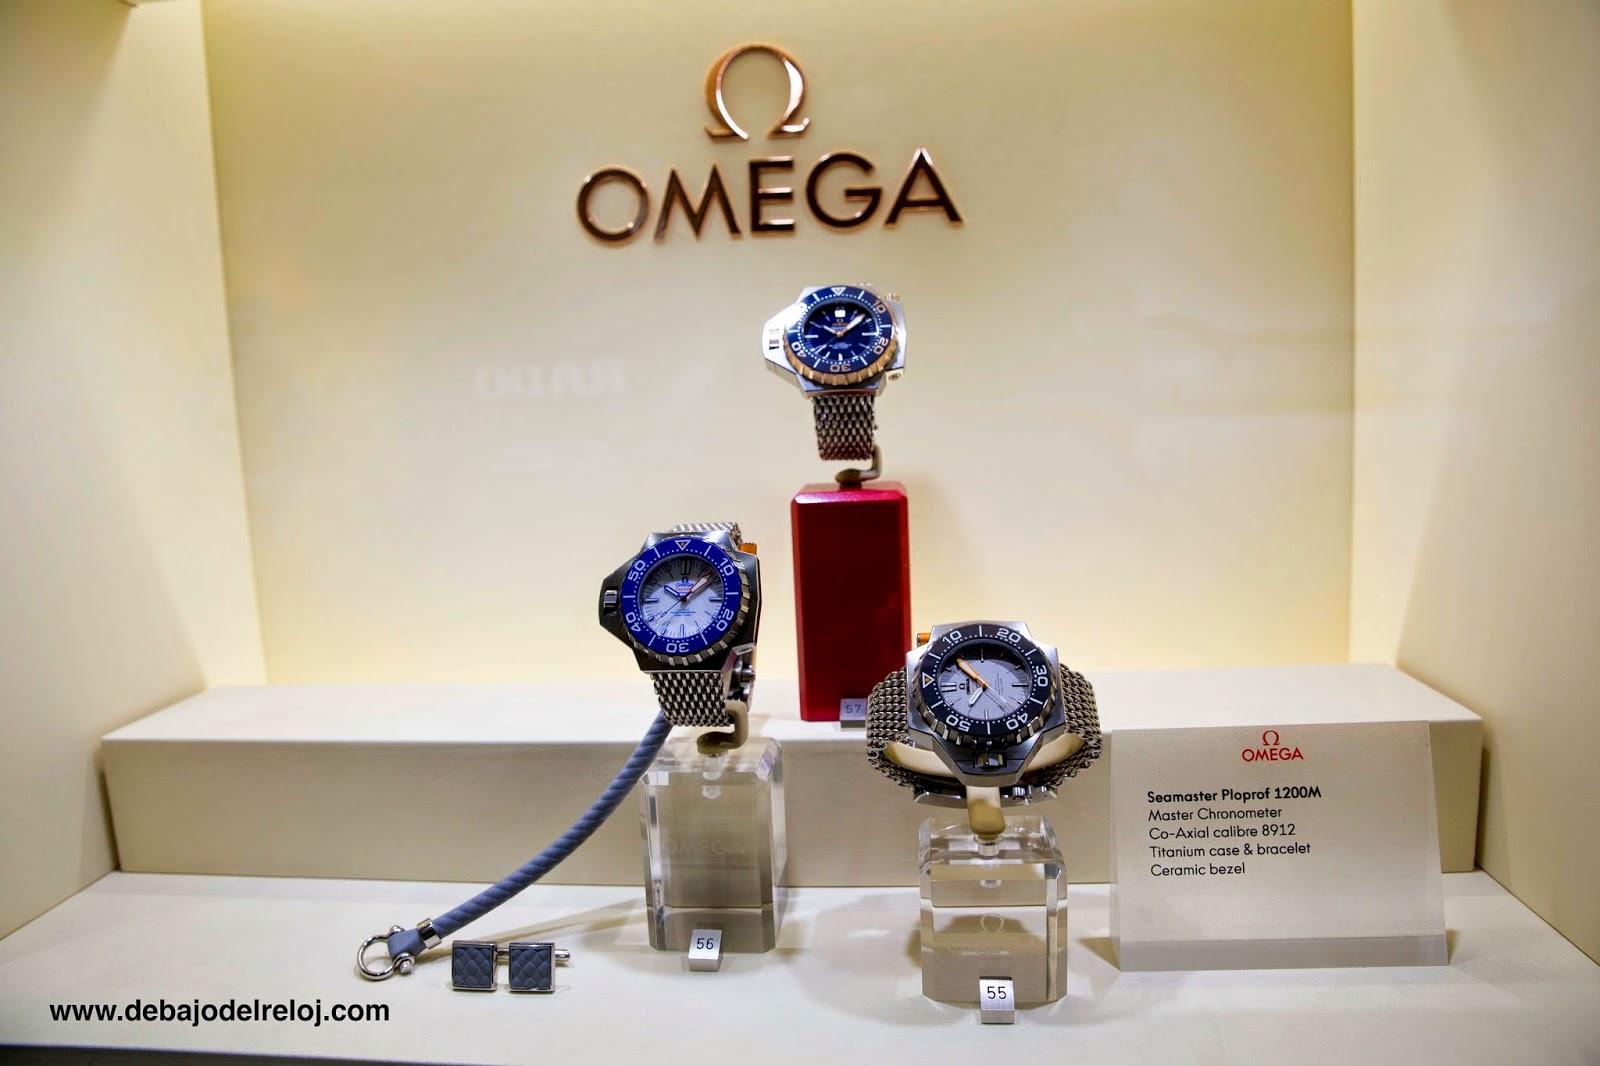 Omega Basel 201518